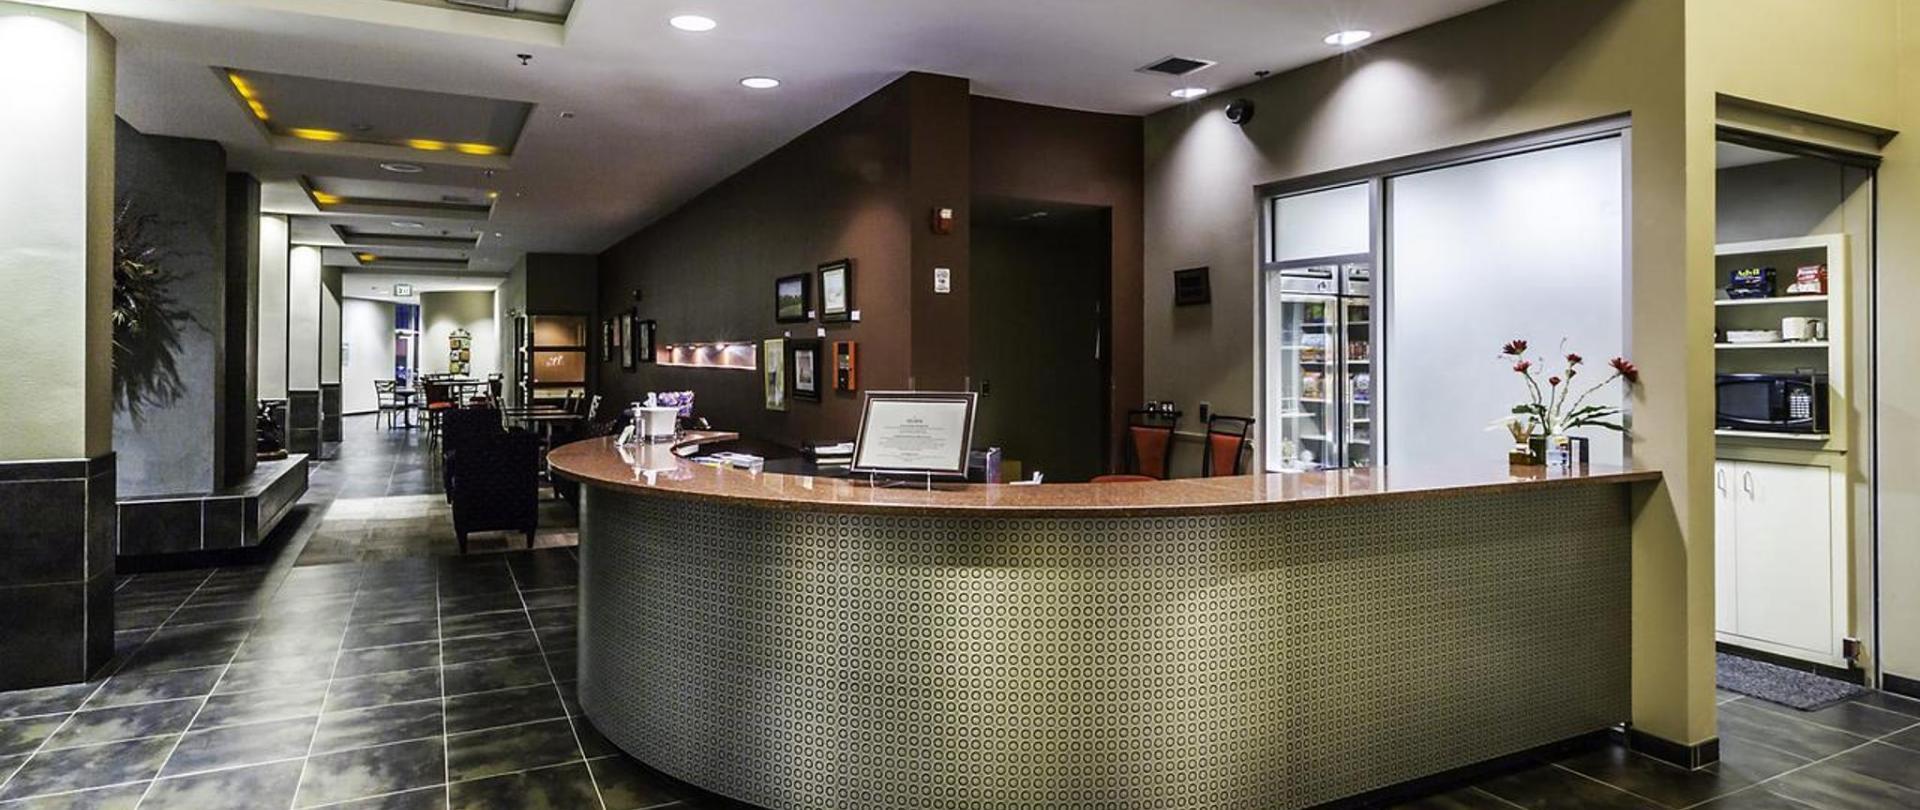 Hotel Artesia NM lobby